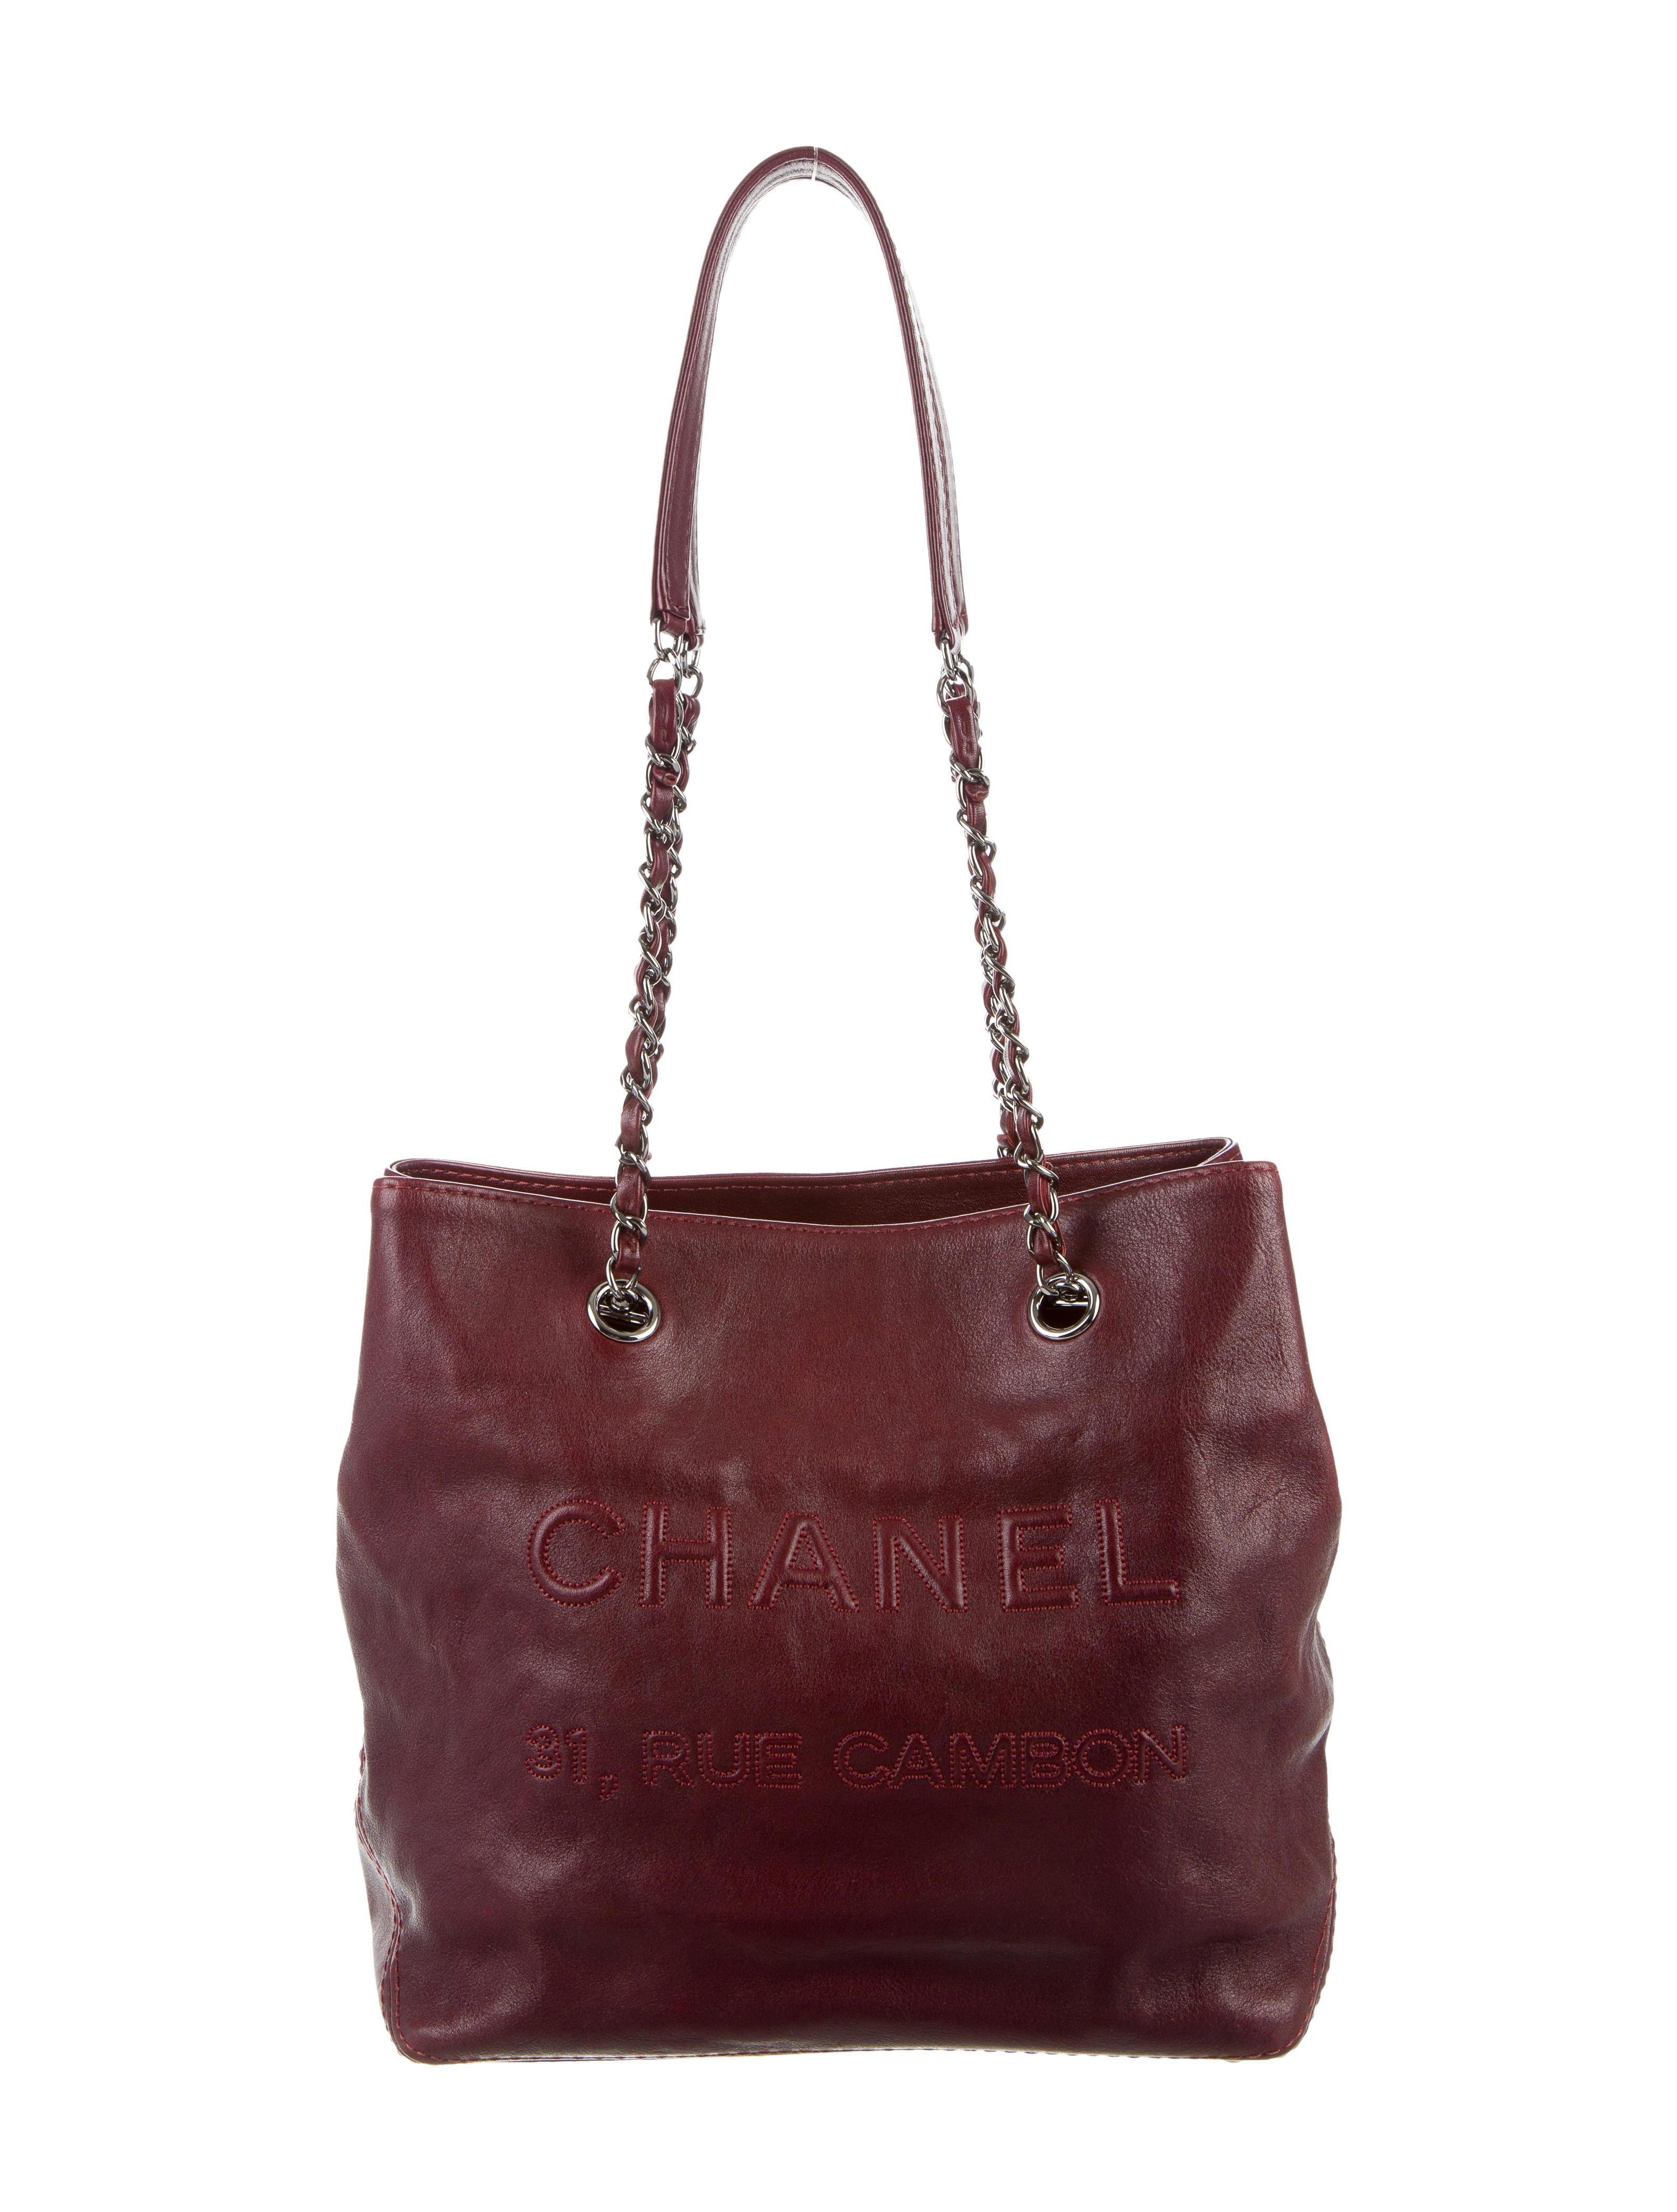 Chanel 31 Rue Cambon Chain Bag Handbags Cha160494